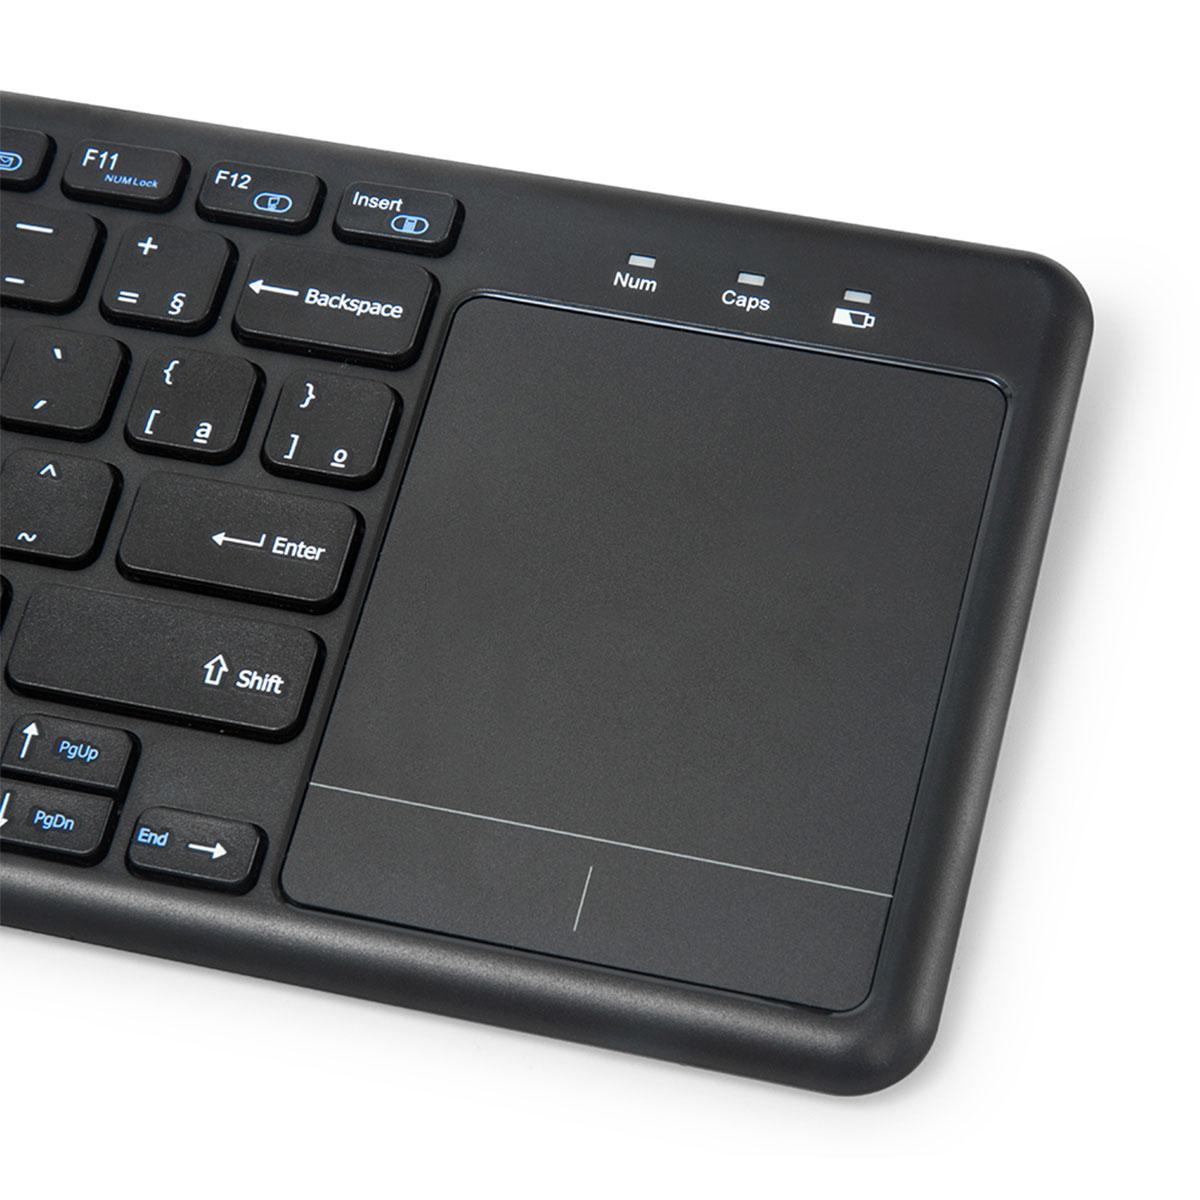 Teclado C3Tech K-WT100BK, Wireless com Touch Pad Integrado, ABNT2